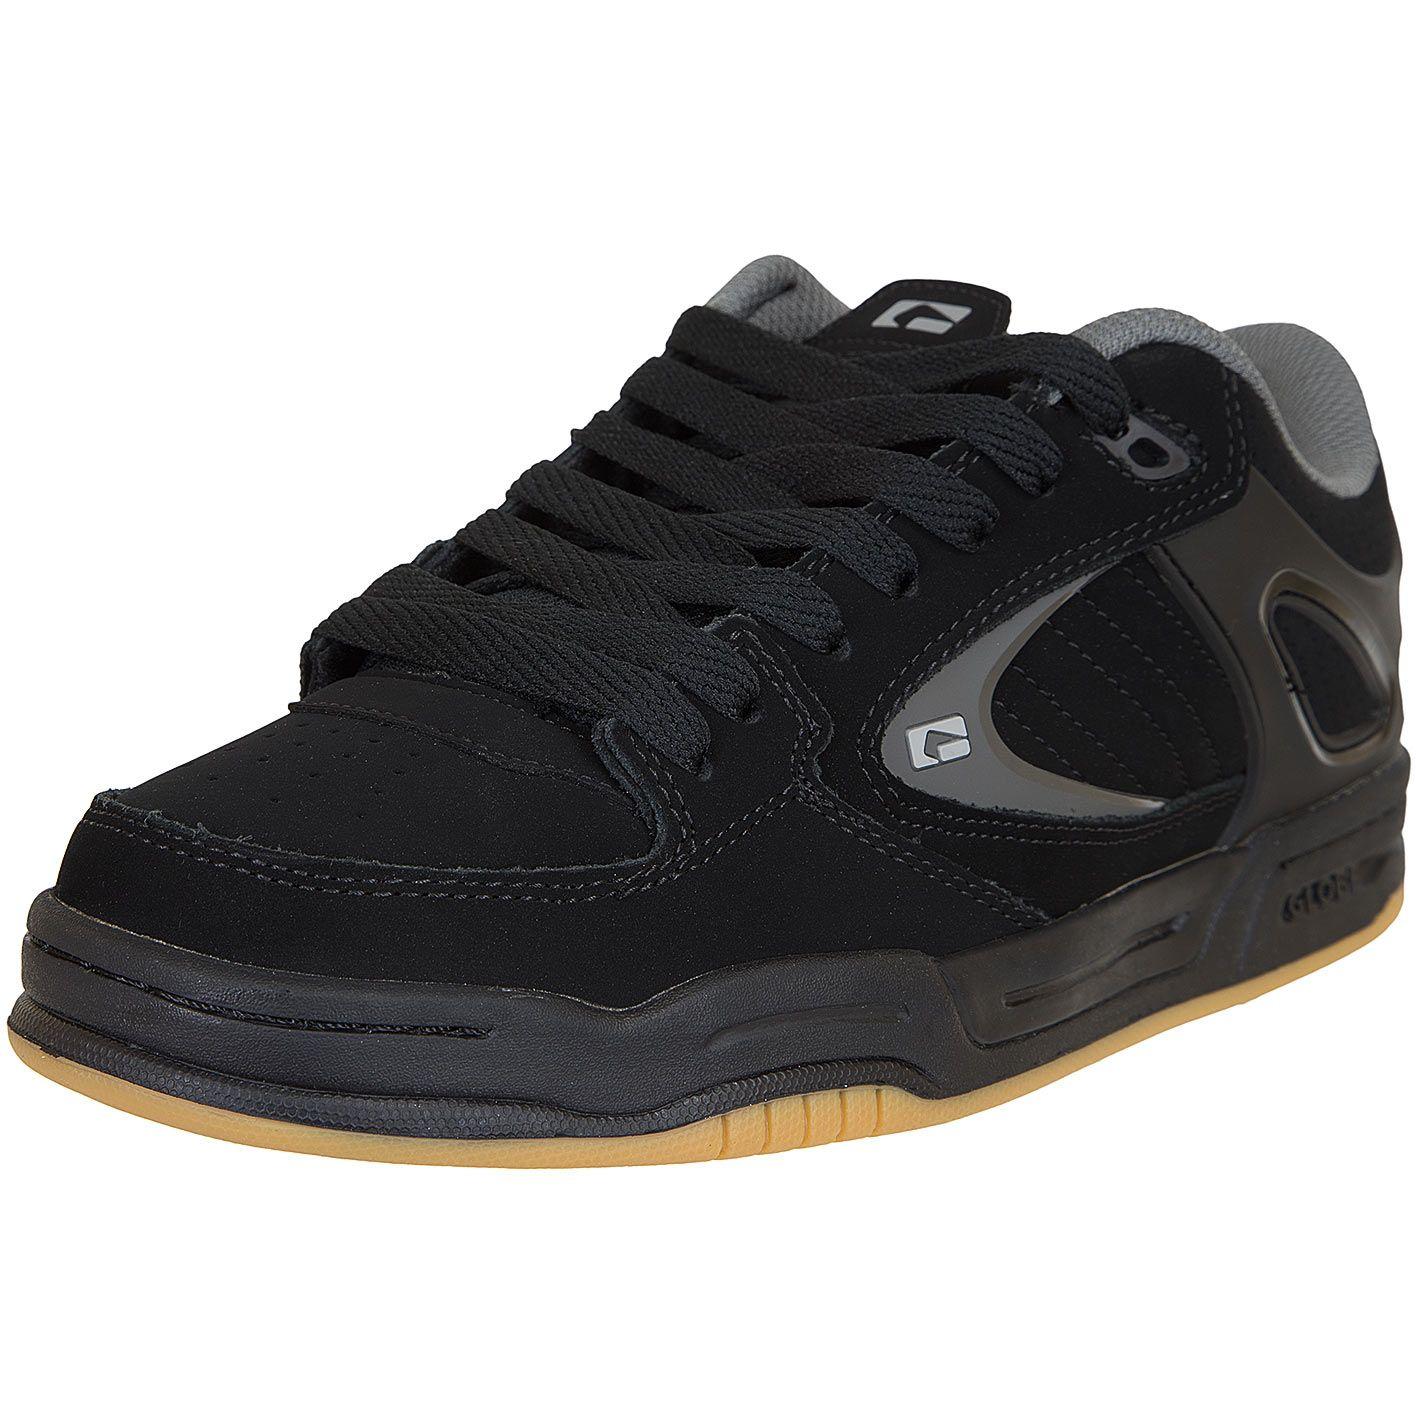 c78acf4384198c ☆ Globe Sneaker Agent schwarz dunkelgrau - hier bestellen ...